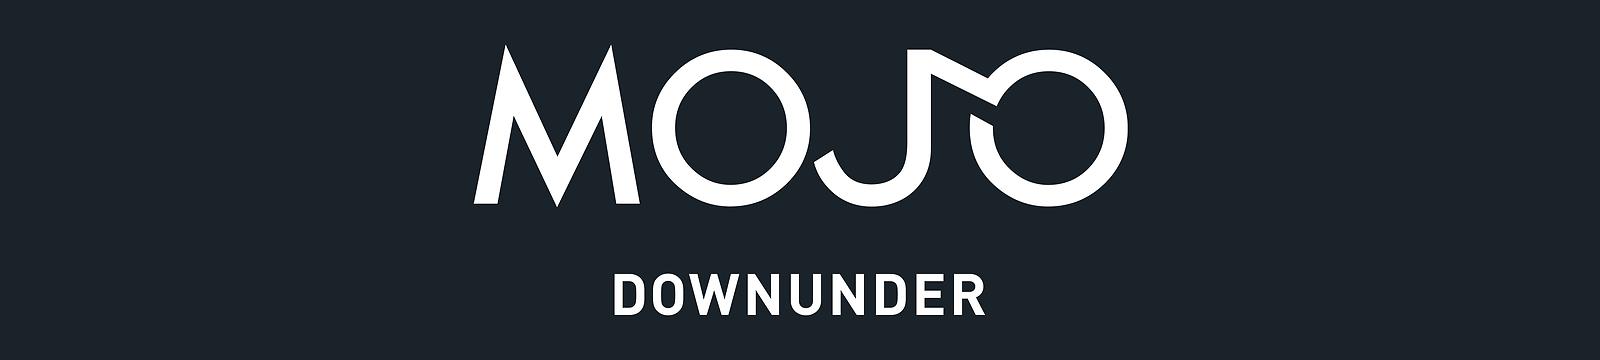 mojodownunder2.0